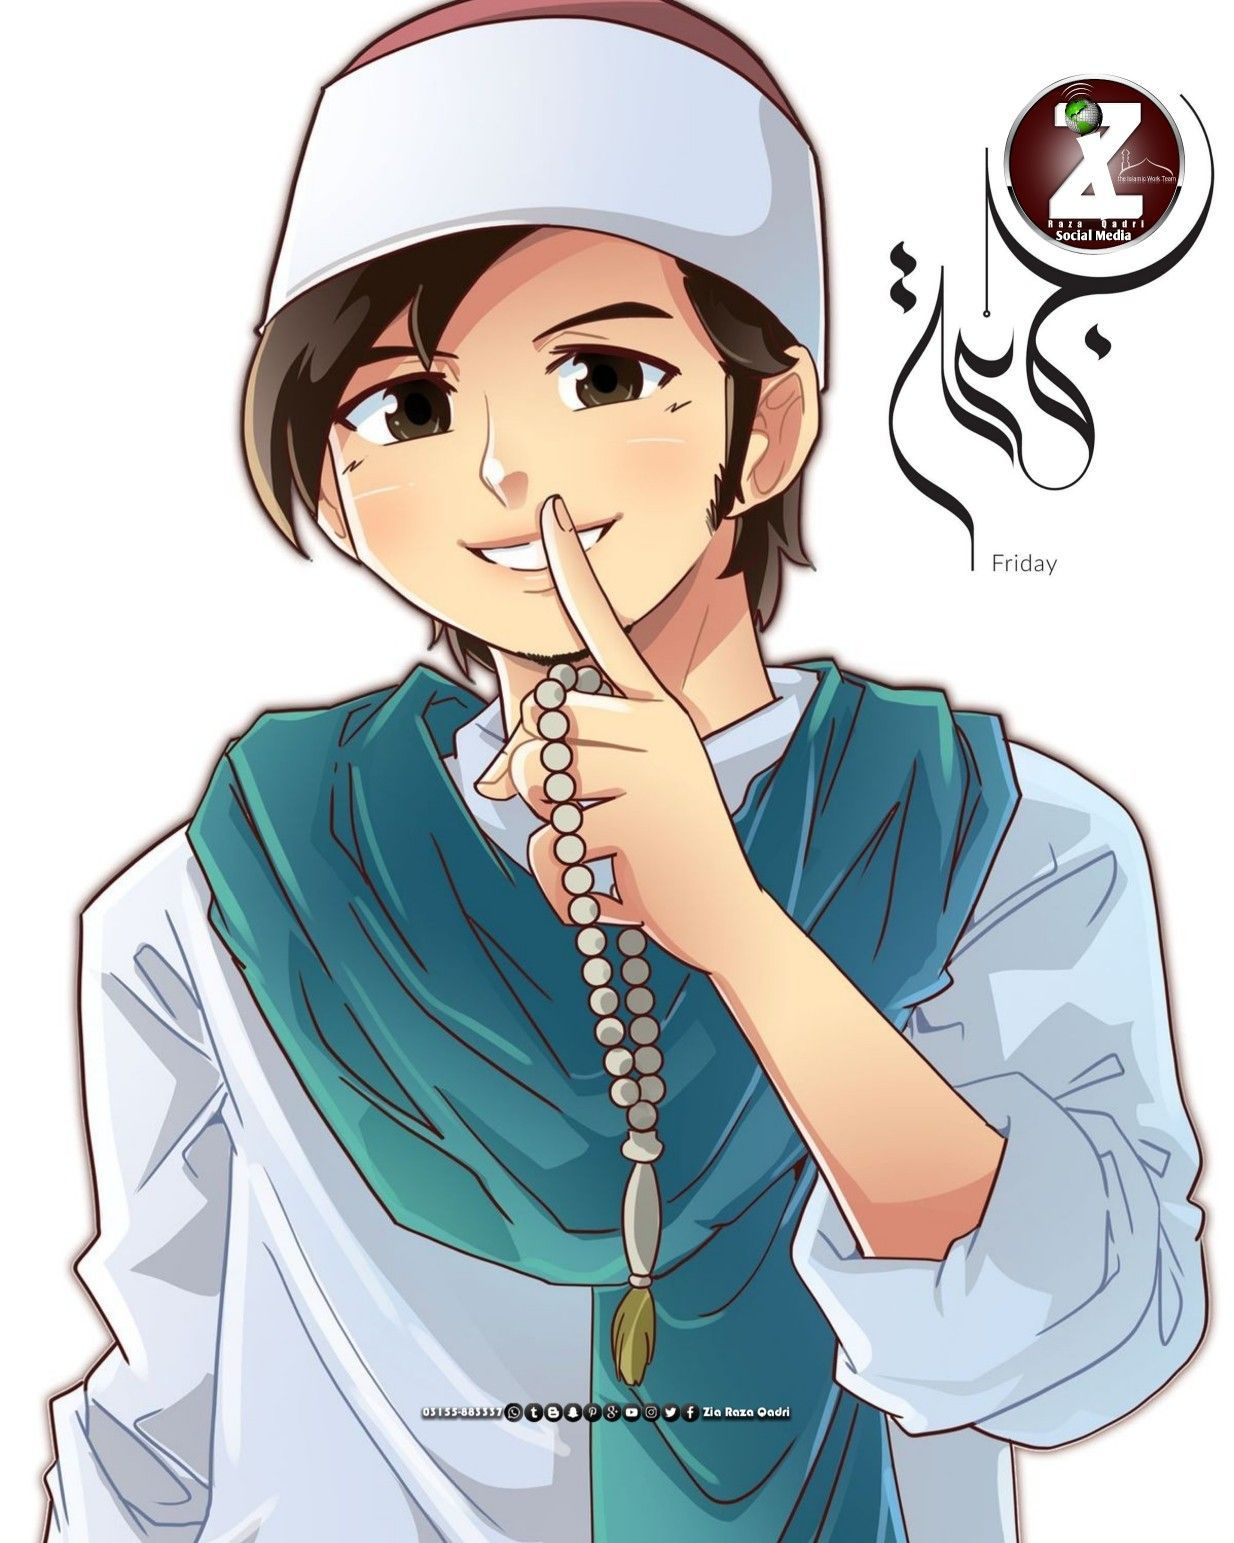 This Video Is Unavailable Luar Biasa 1 Wallpaper Muslim Cartoon Boy Ethics Hijab Anime Di 2019 Kartun Anime I Islamic Cartoon Anime Muslim Cartoon Drawings